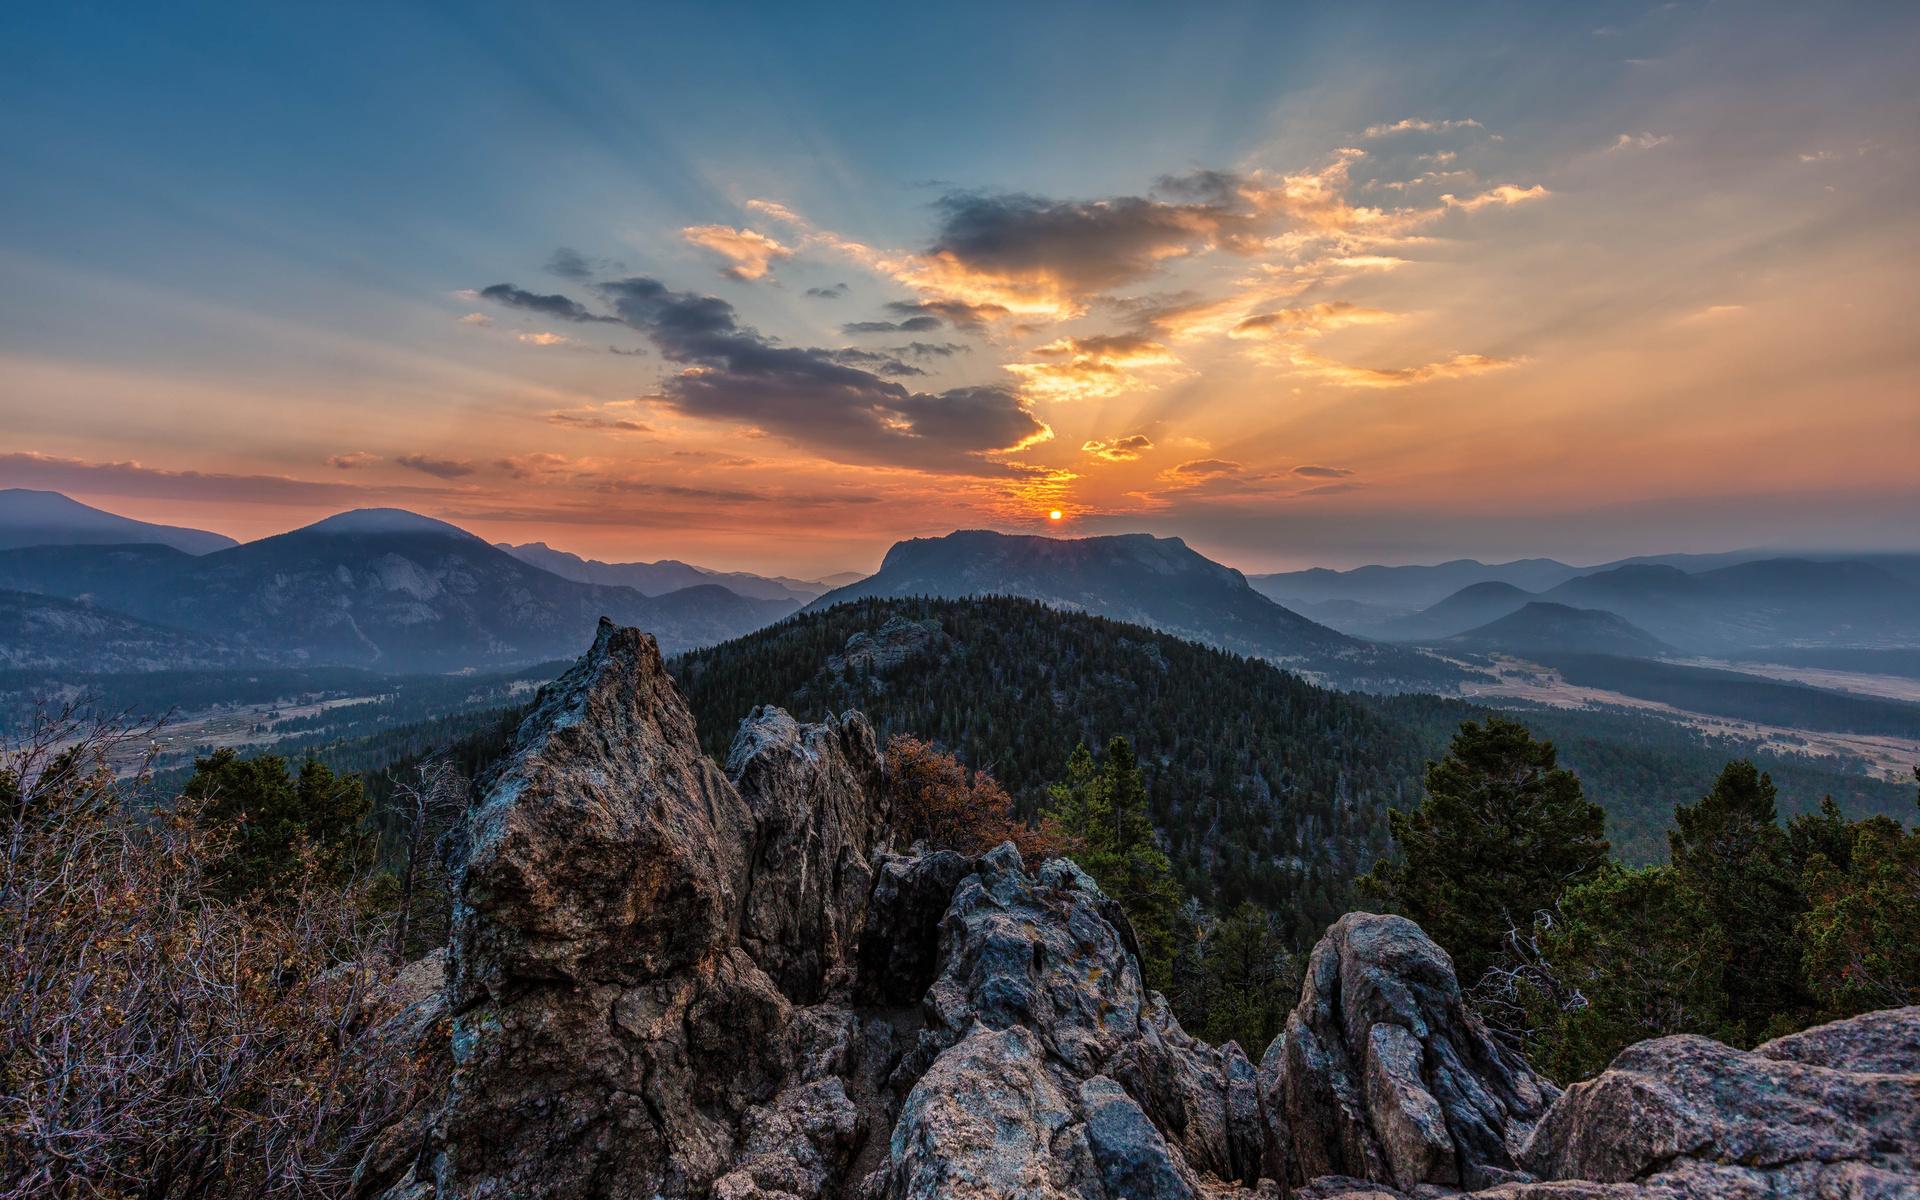 горы, небо, rockym, mountain, national park, природа